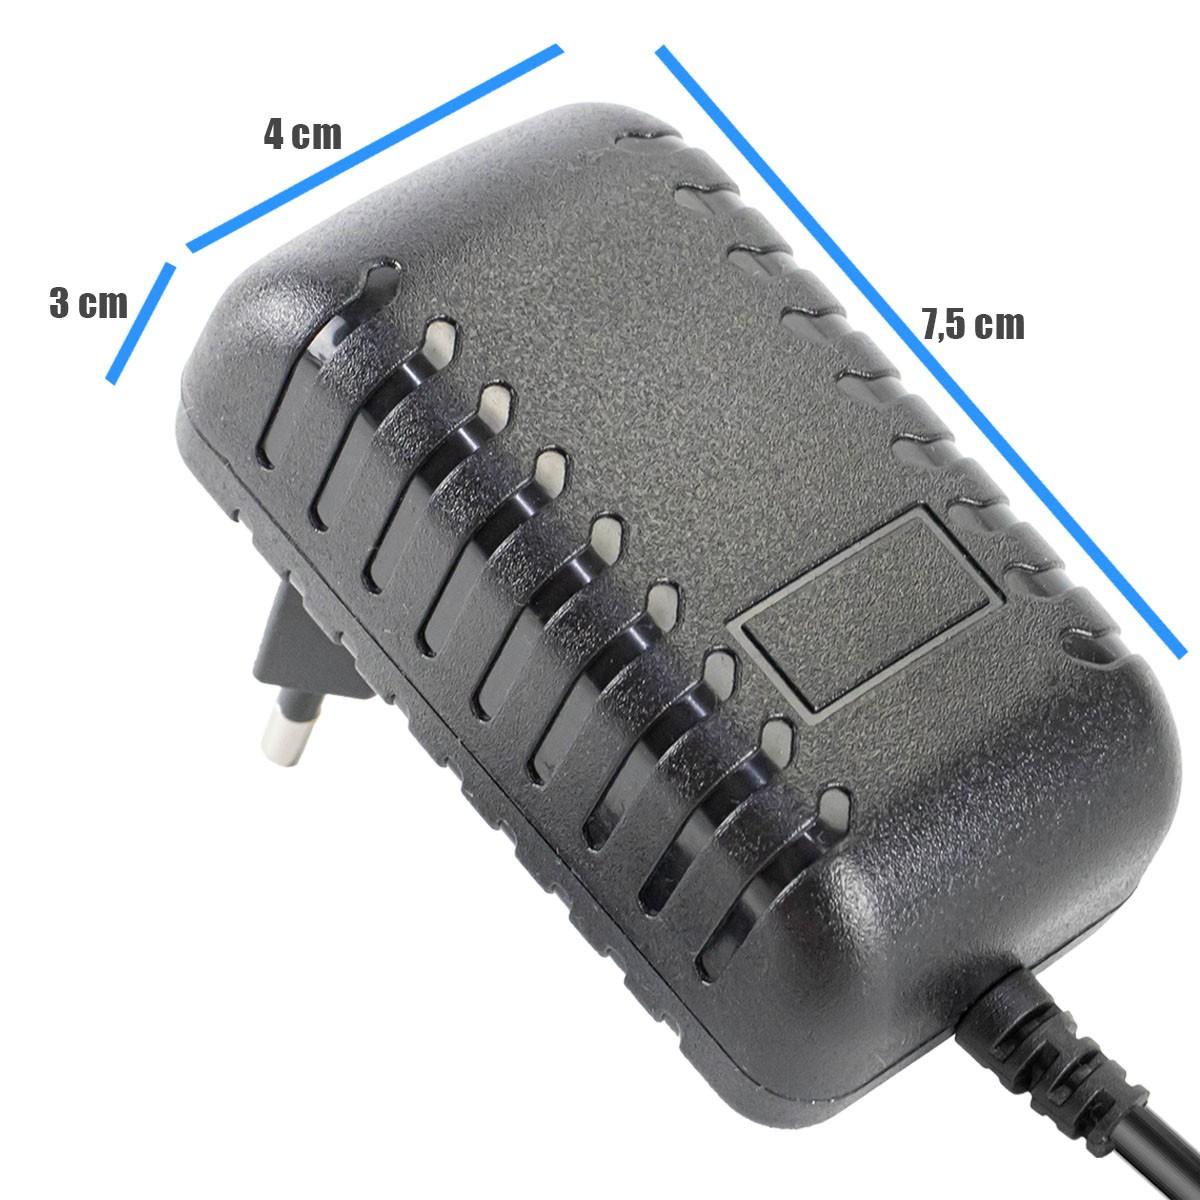 KIT 3x Fonte Chaveada 12v 3a Plug P4 5,5x2,5mm Bivolt LE-0174